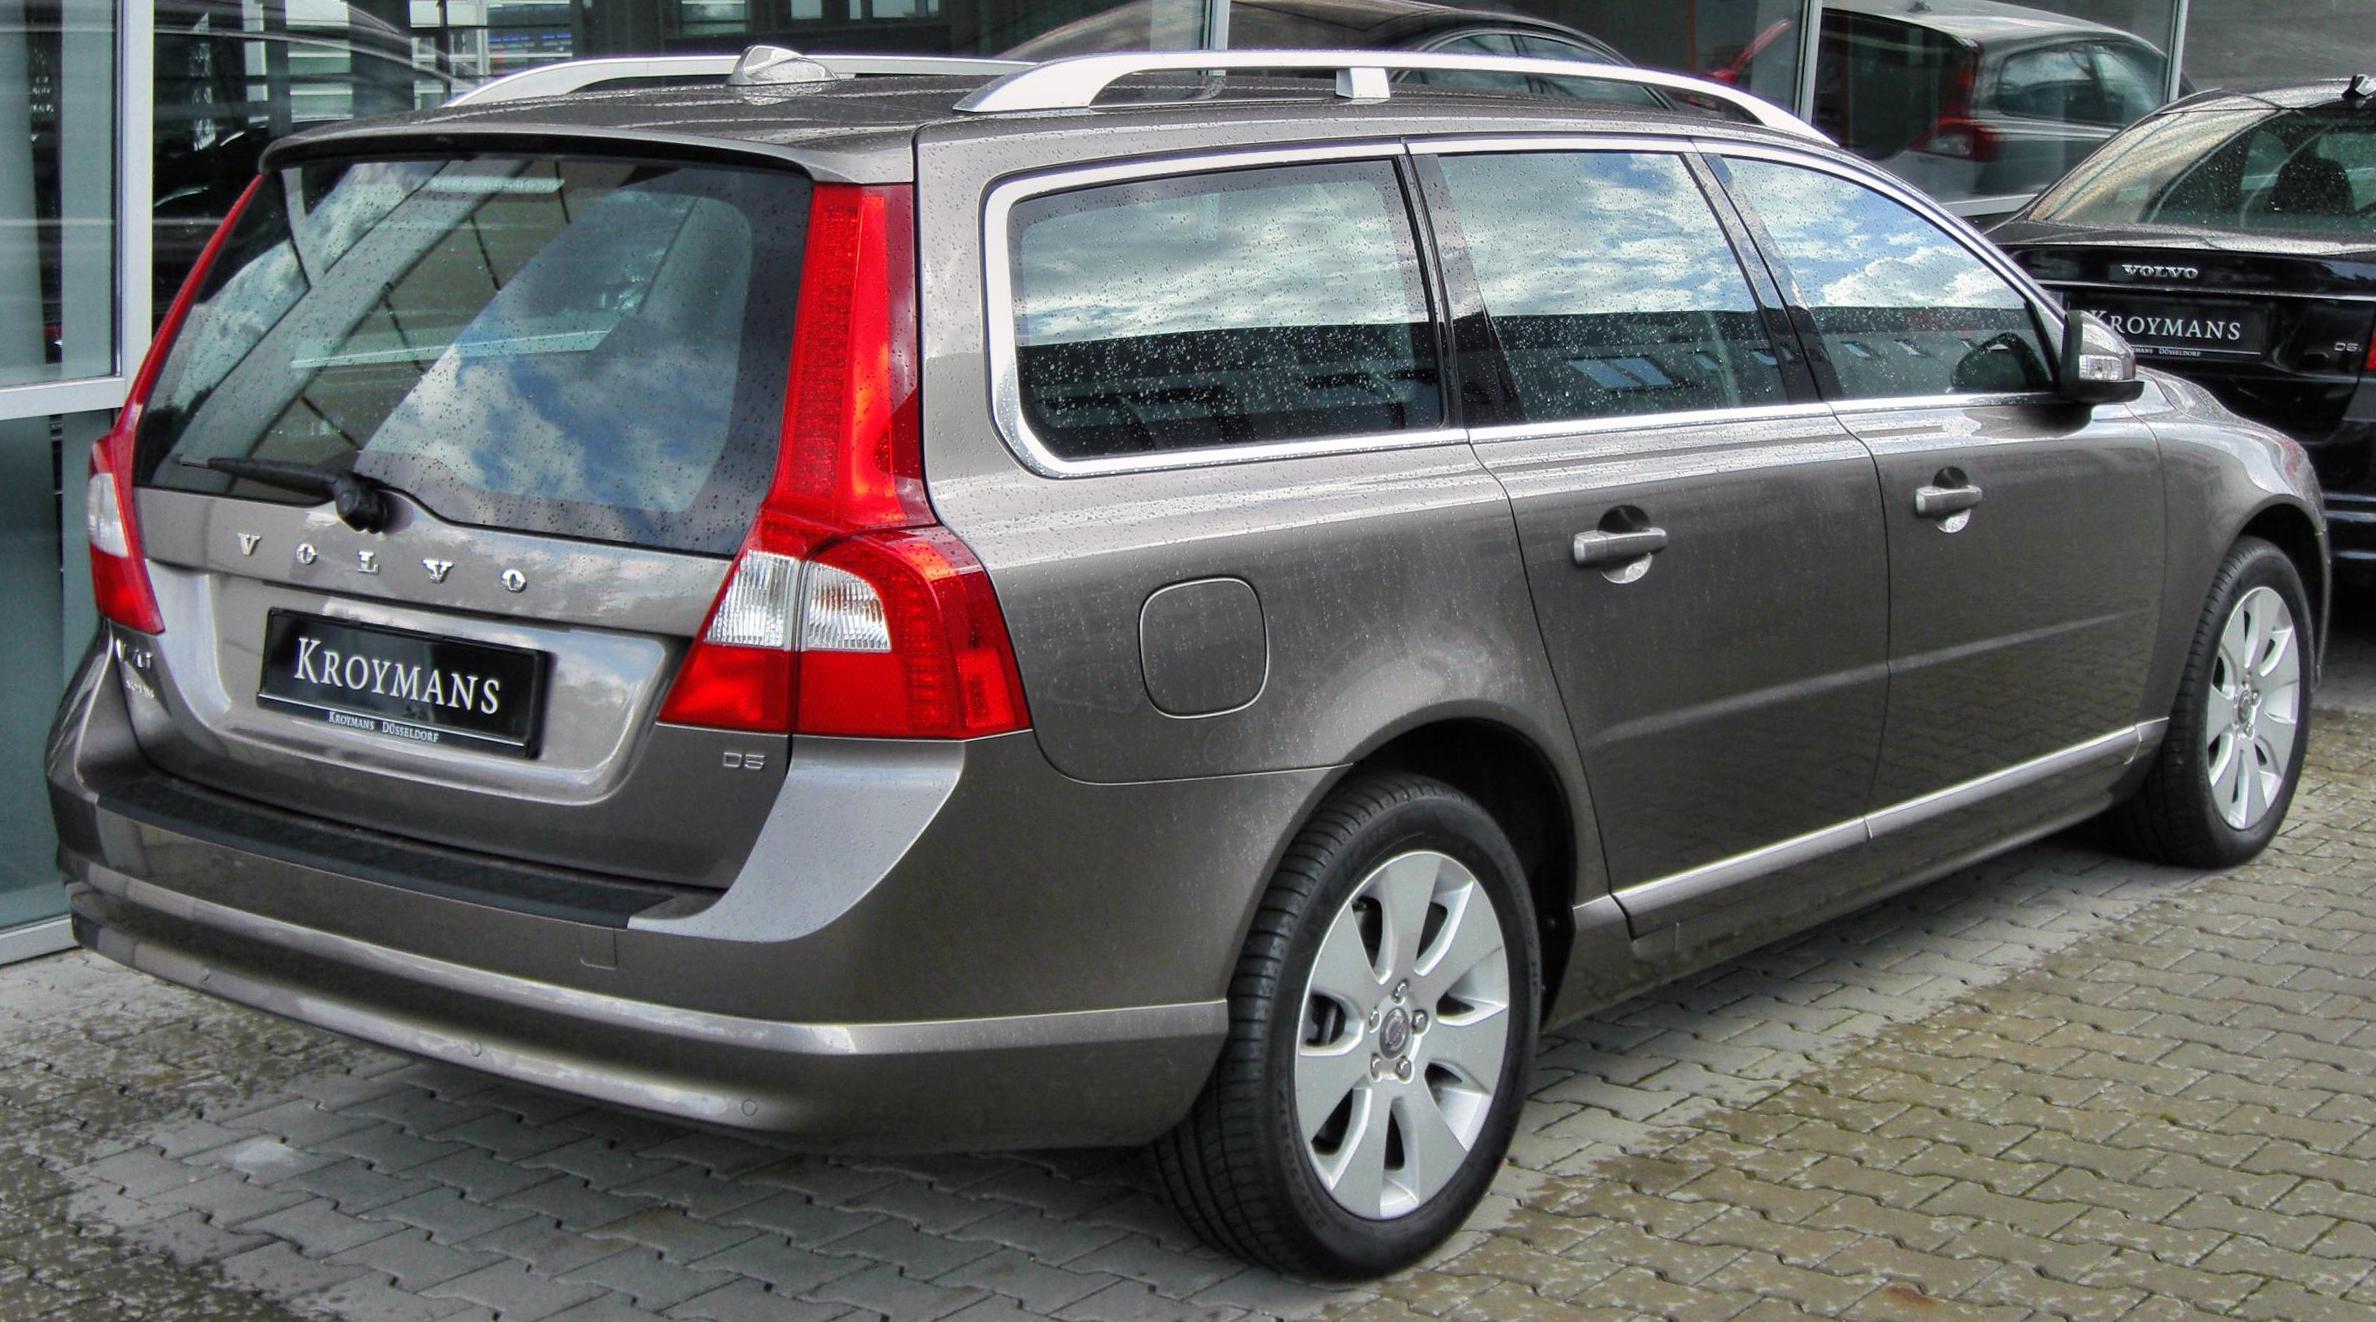 volvo v70 car technical data car specifications vehicle fuel consumption information. Black Bedroom Furniture Sets. Home Design Ideas